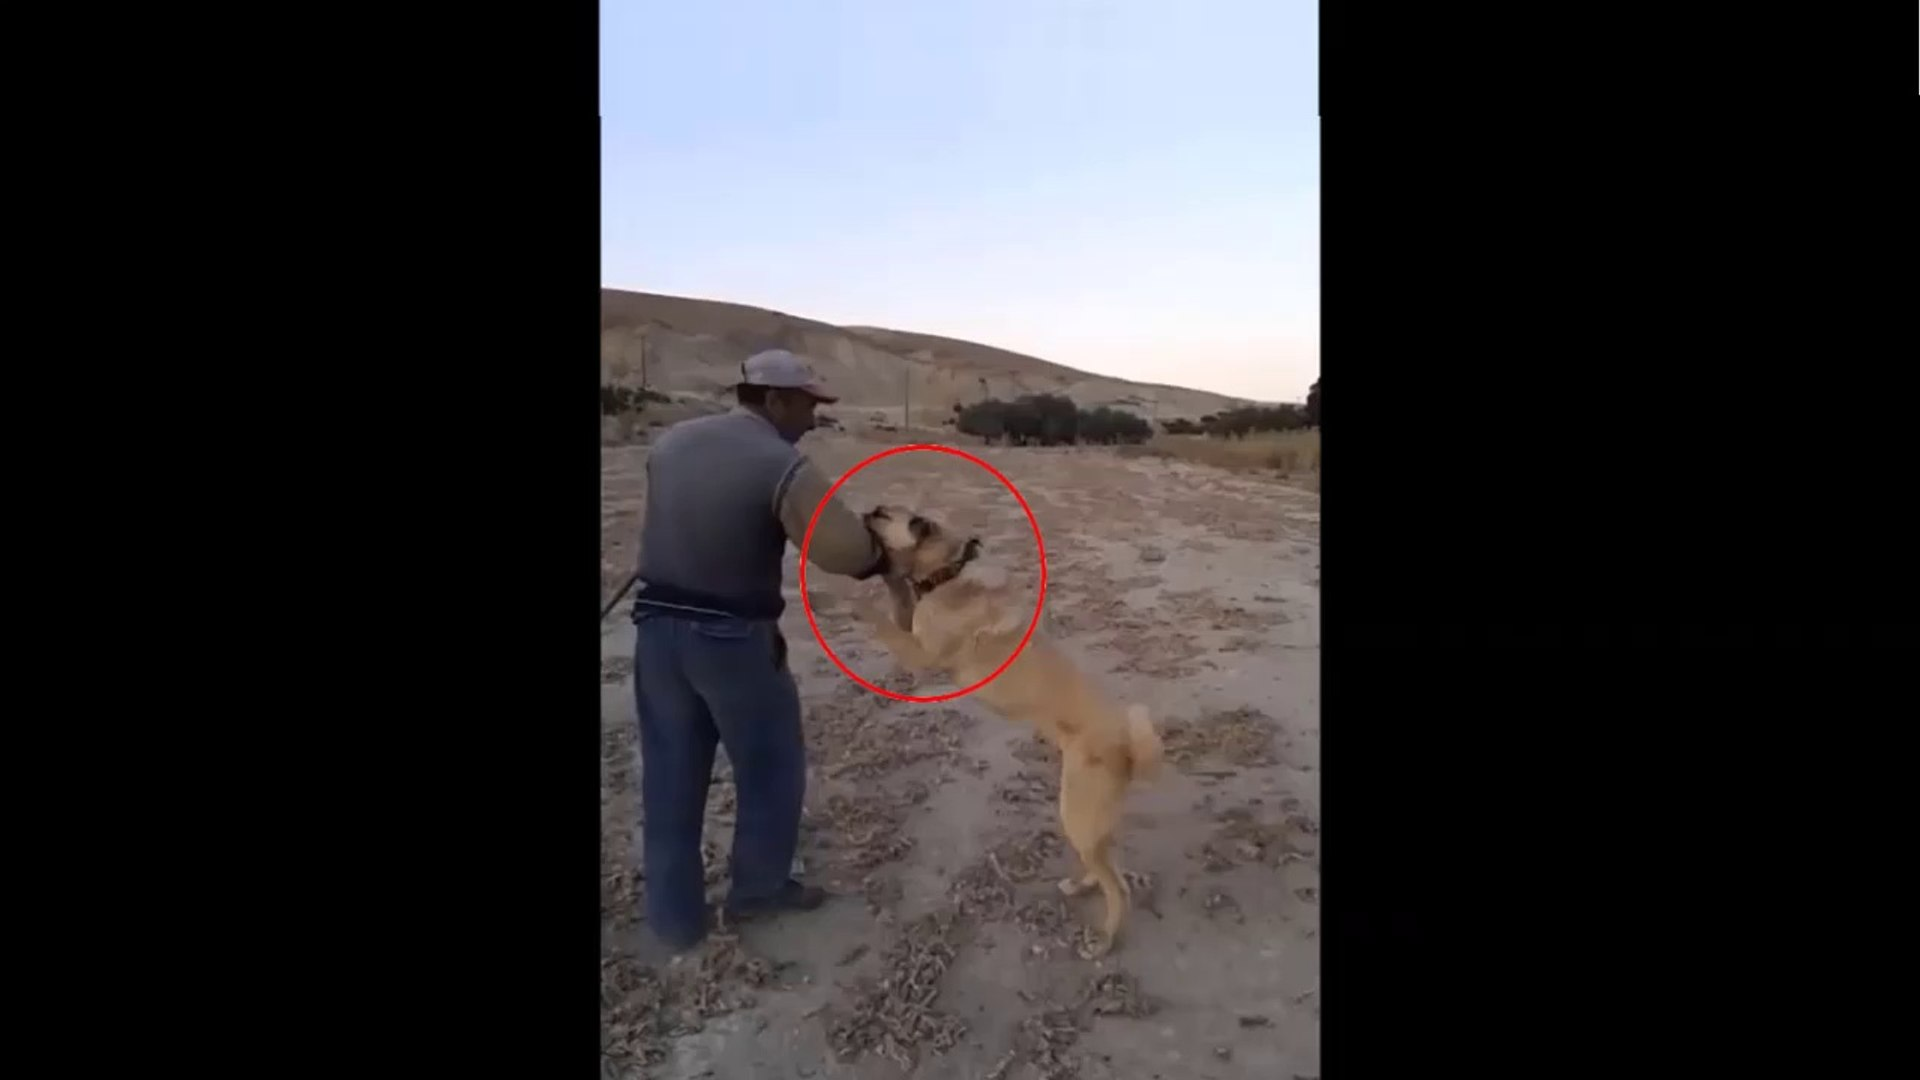 ANADOLU COBAN KOPEKLERi GOREV BASINDA SEViMLi HALLERi - ANATOLiAN SHEPHERD DOGS and SHEEP WATCH